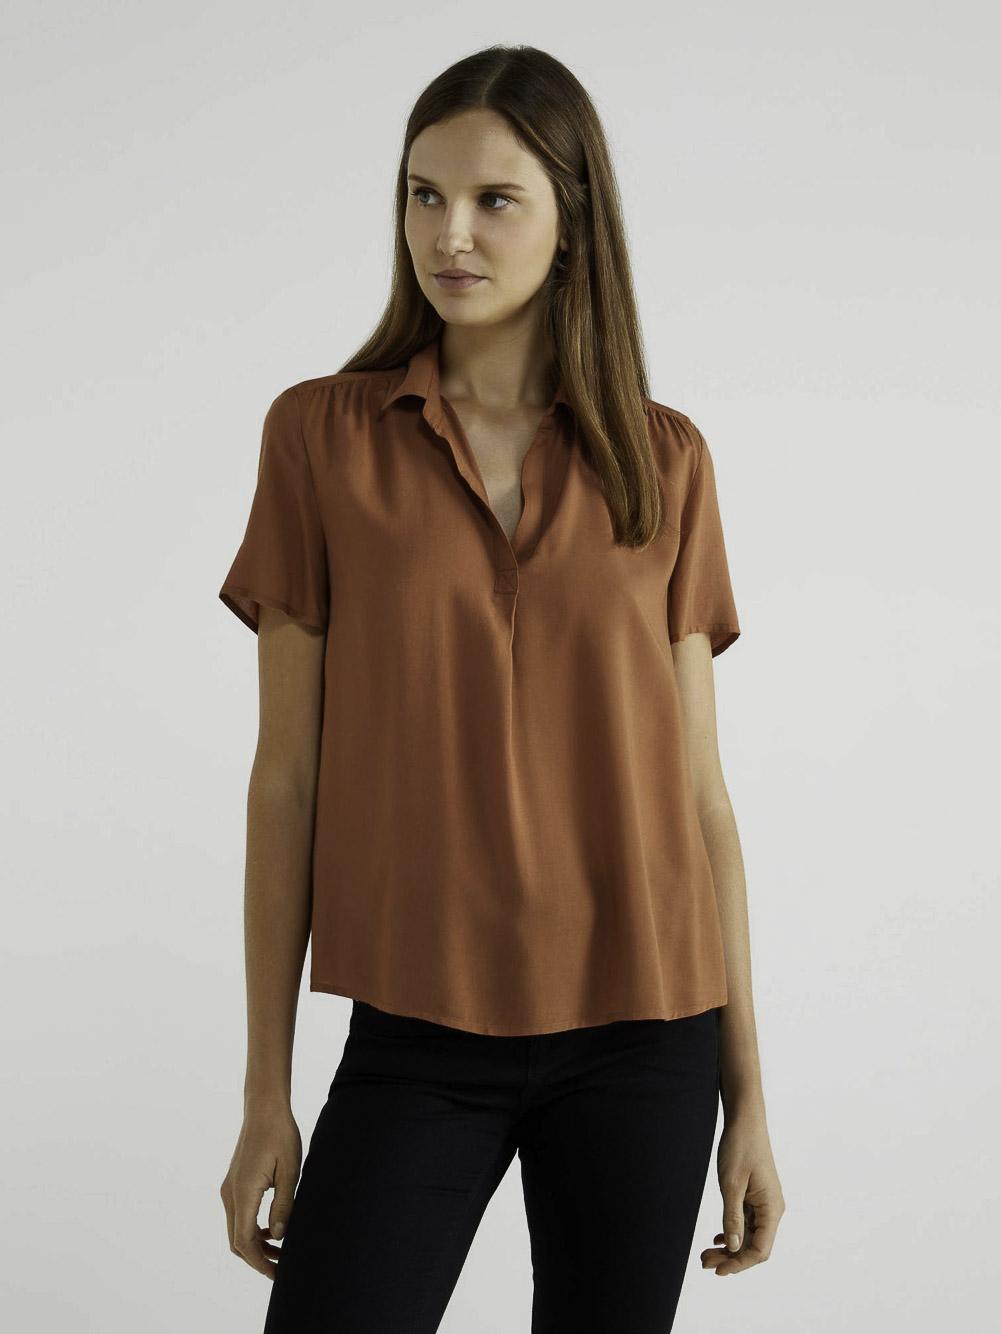 BENETTON Μπλούζα με V λαιμόκοψη 5SF05QBZ3 20A03C